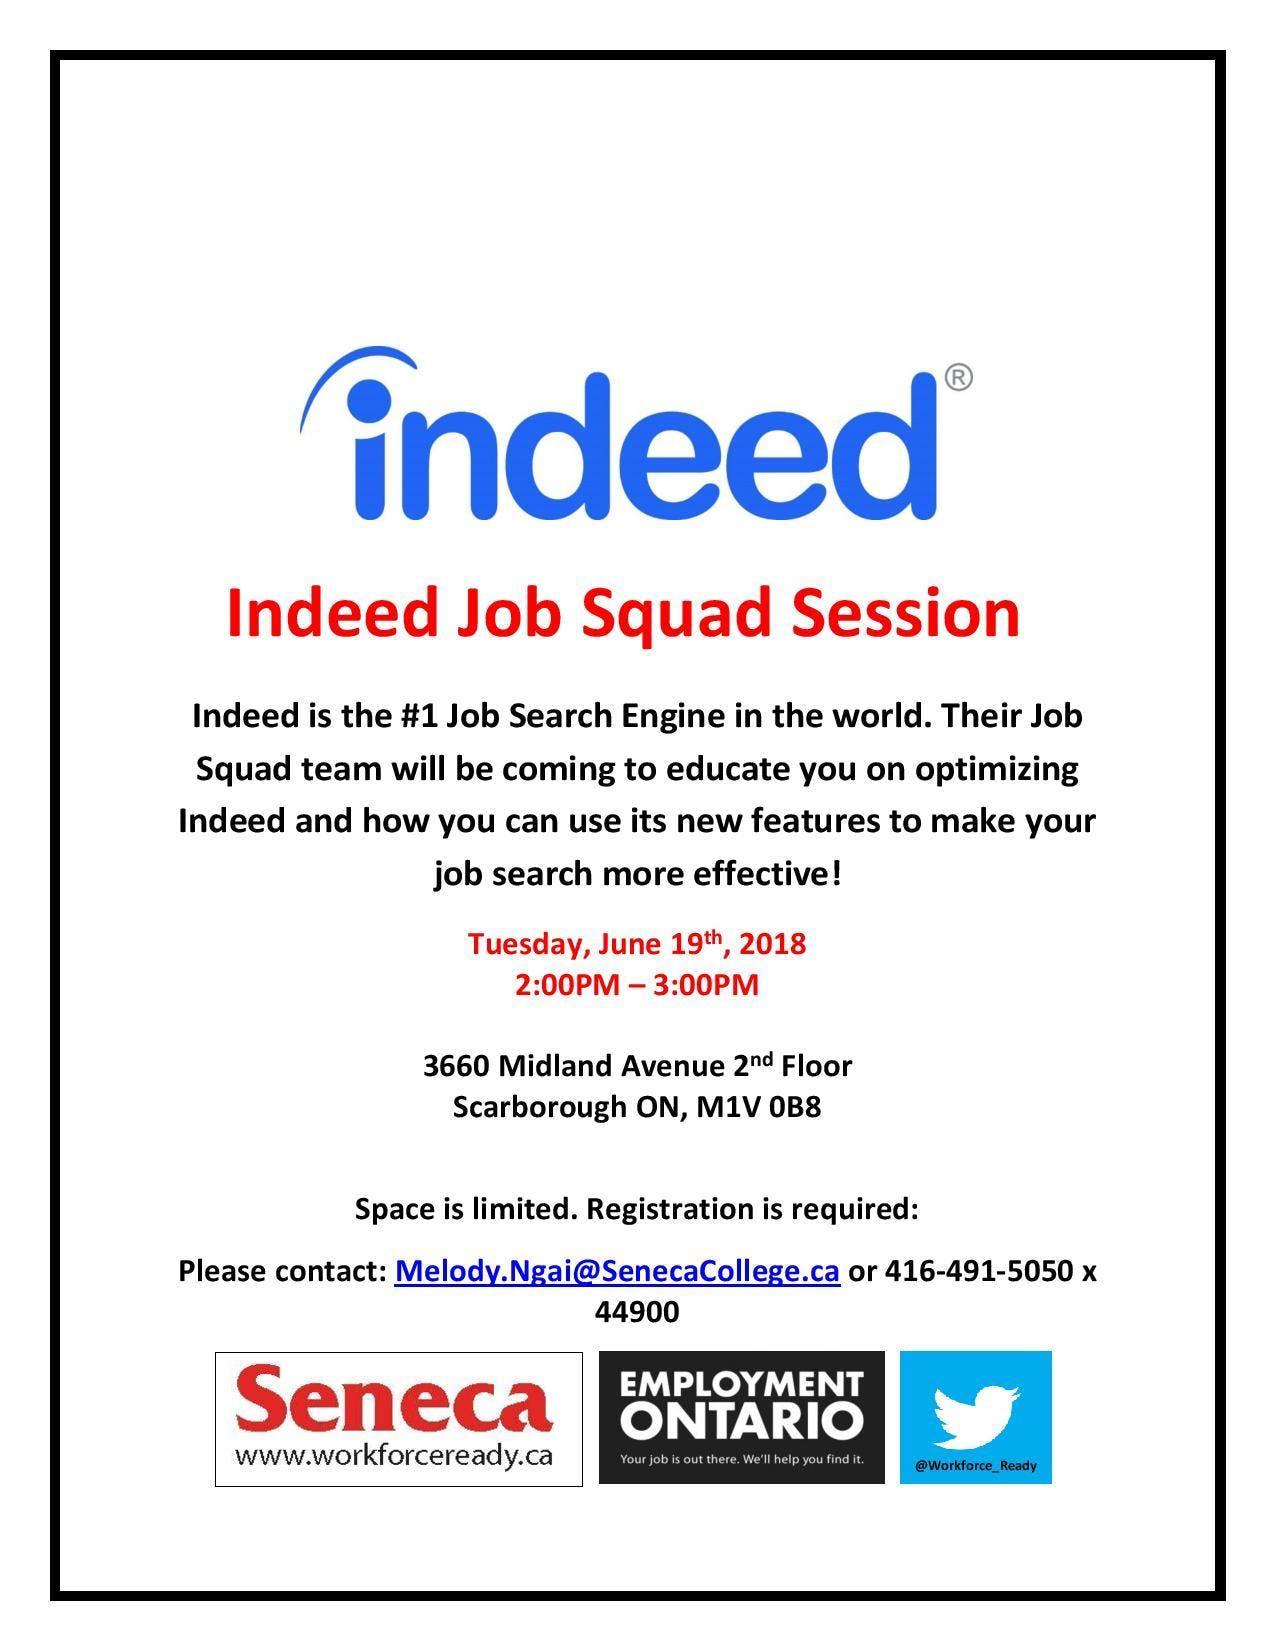 Indeed Job Squad Session at Seneca Employment Services, Toronto